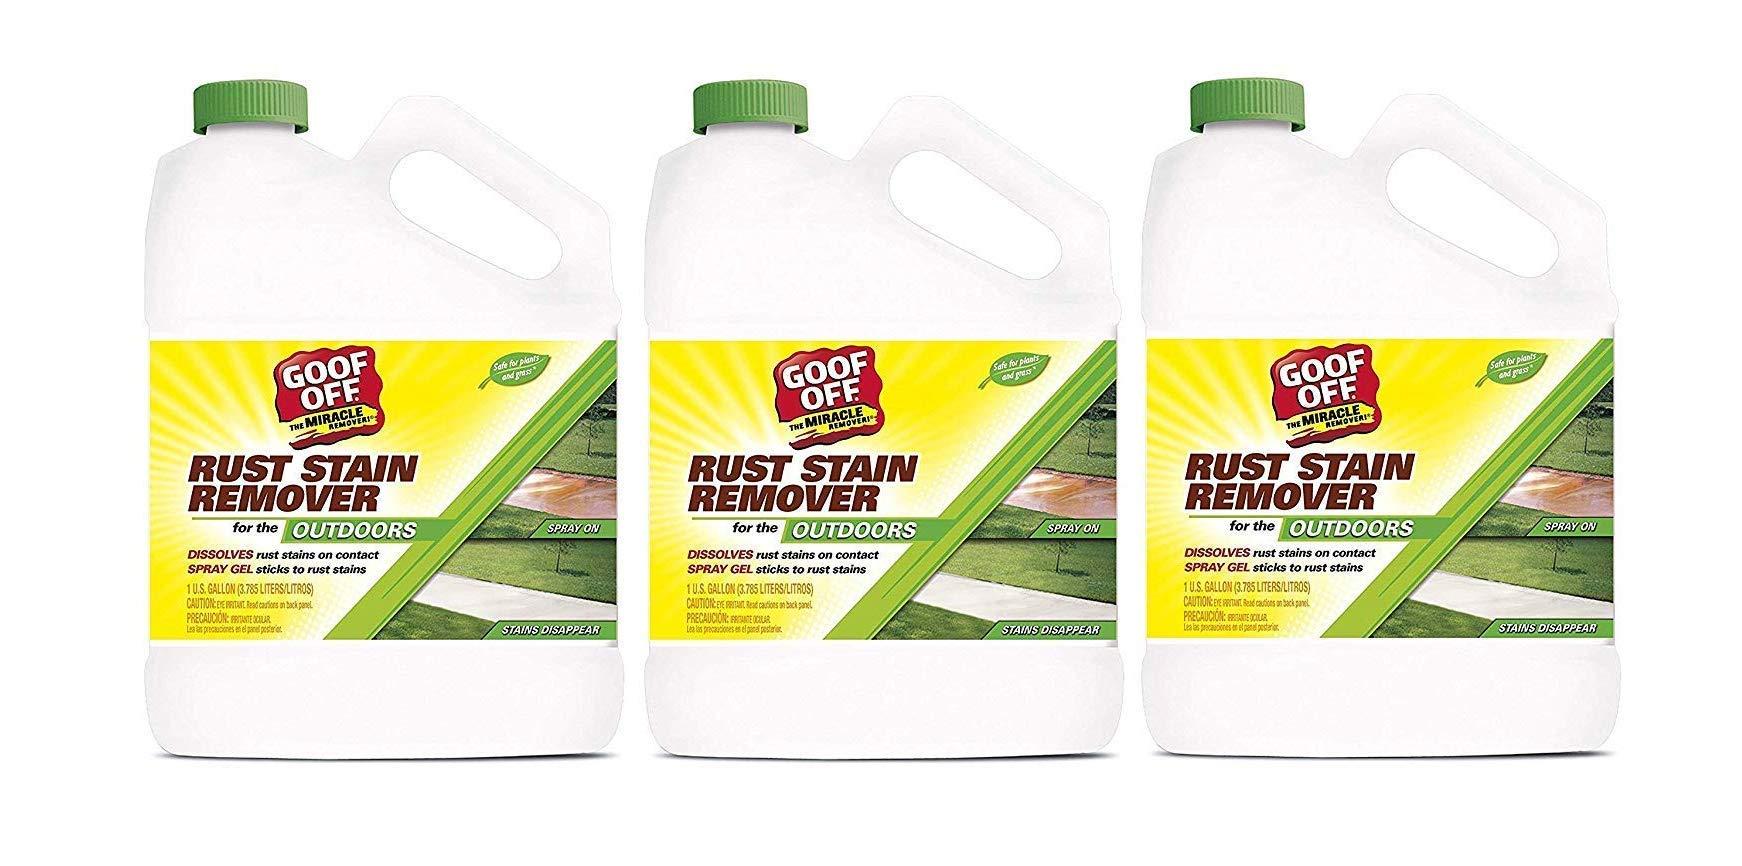 RustAid GSX00101 Goof, 1 Gallon GAL Rust Stain Remover, (Тhree Pаck)